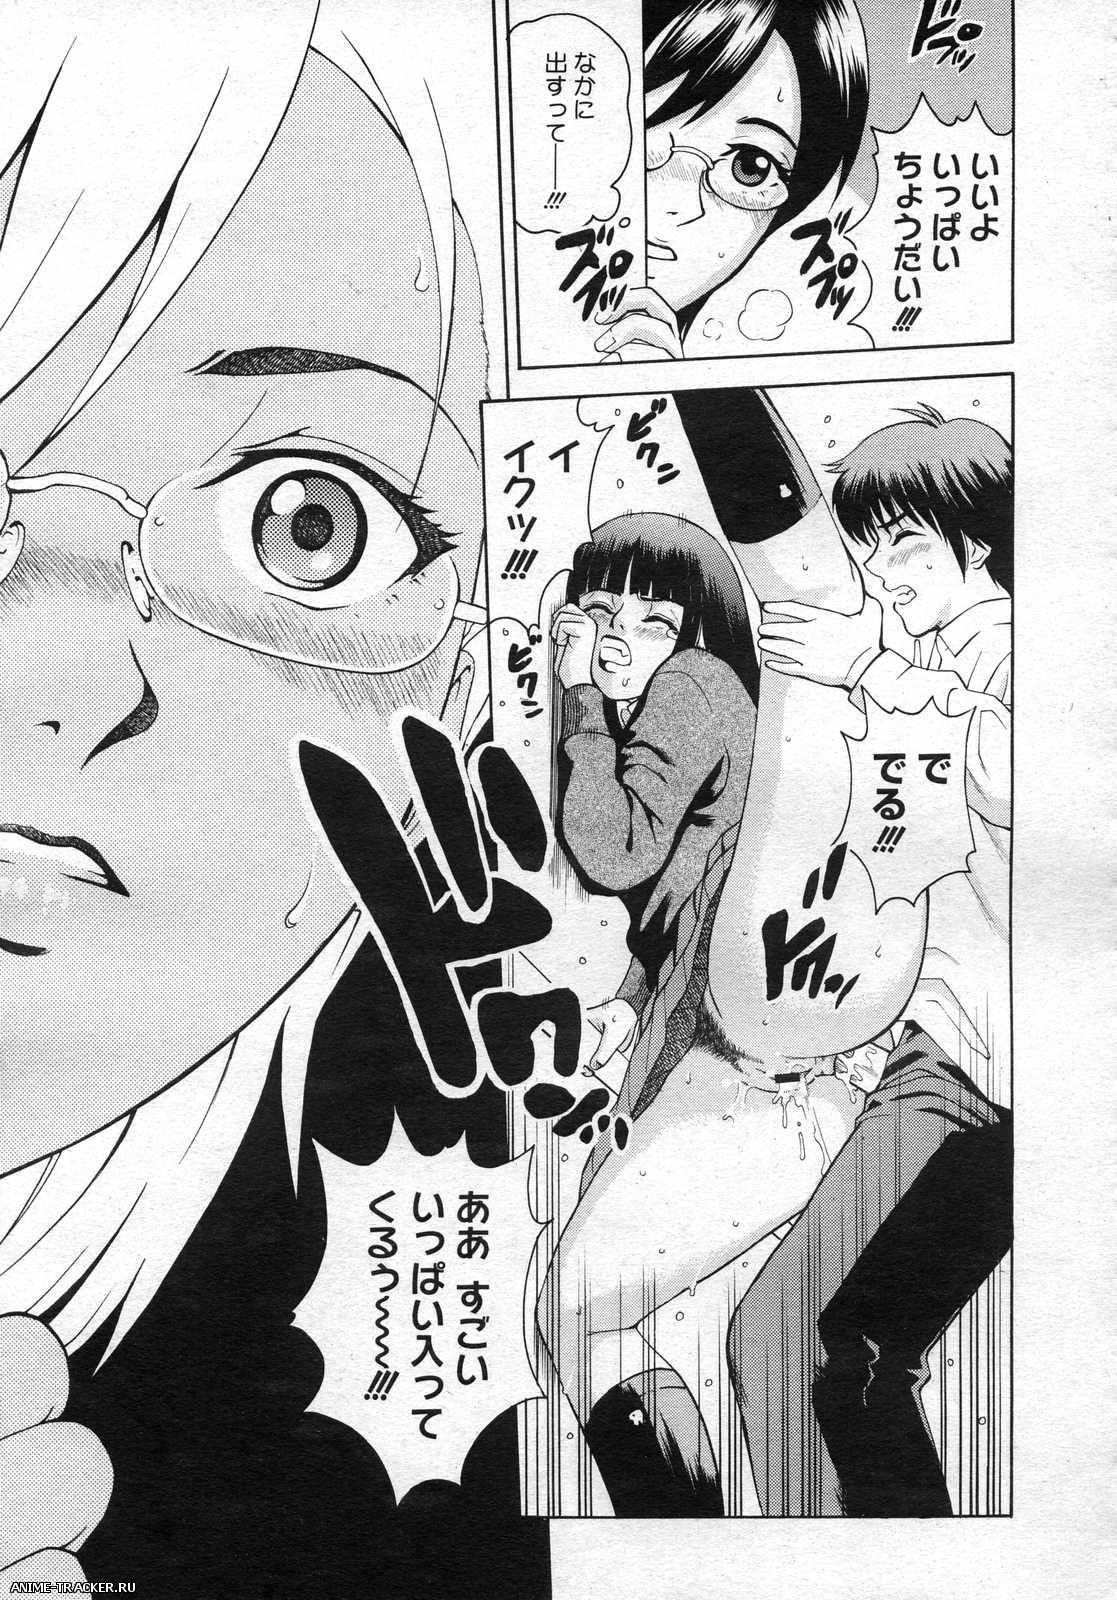 Журнал COMIC Megastore H [2002-2013] [Cen] [JAP] Manga Hentai